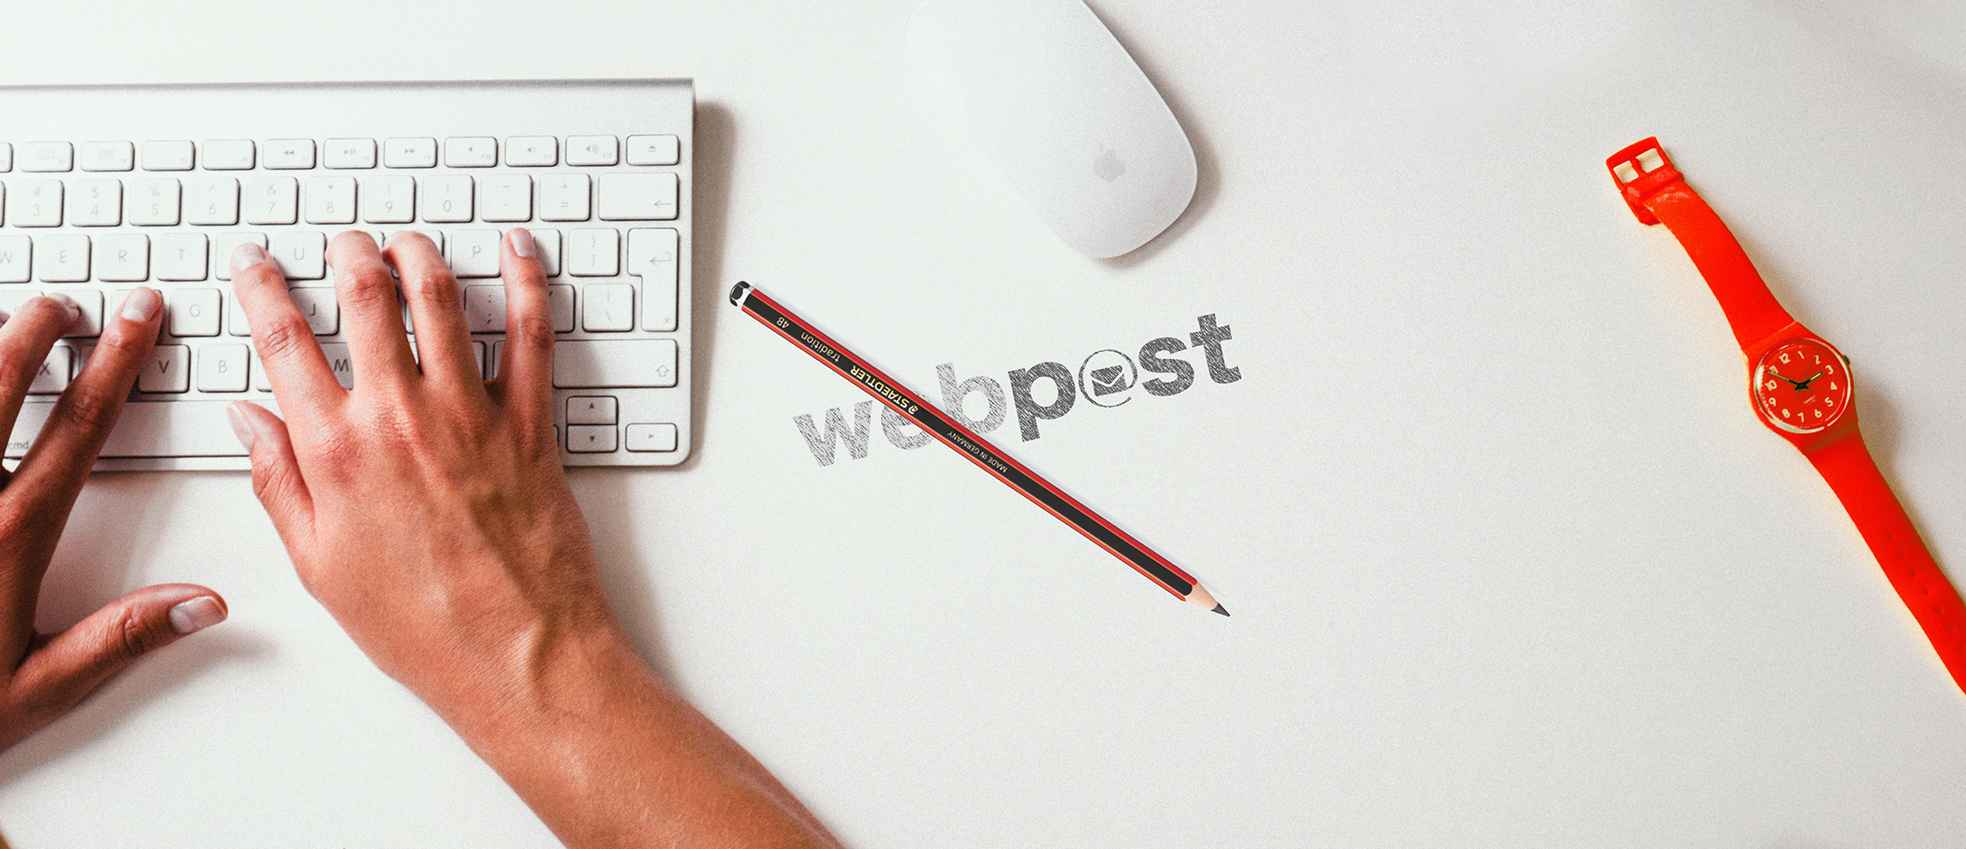 Webpost Hybrid Mail